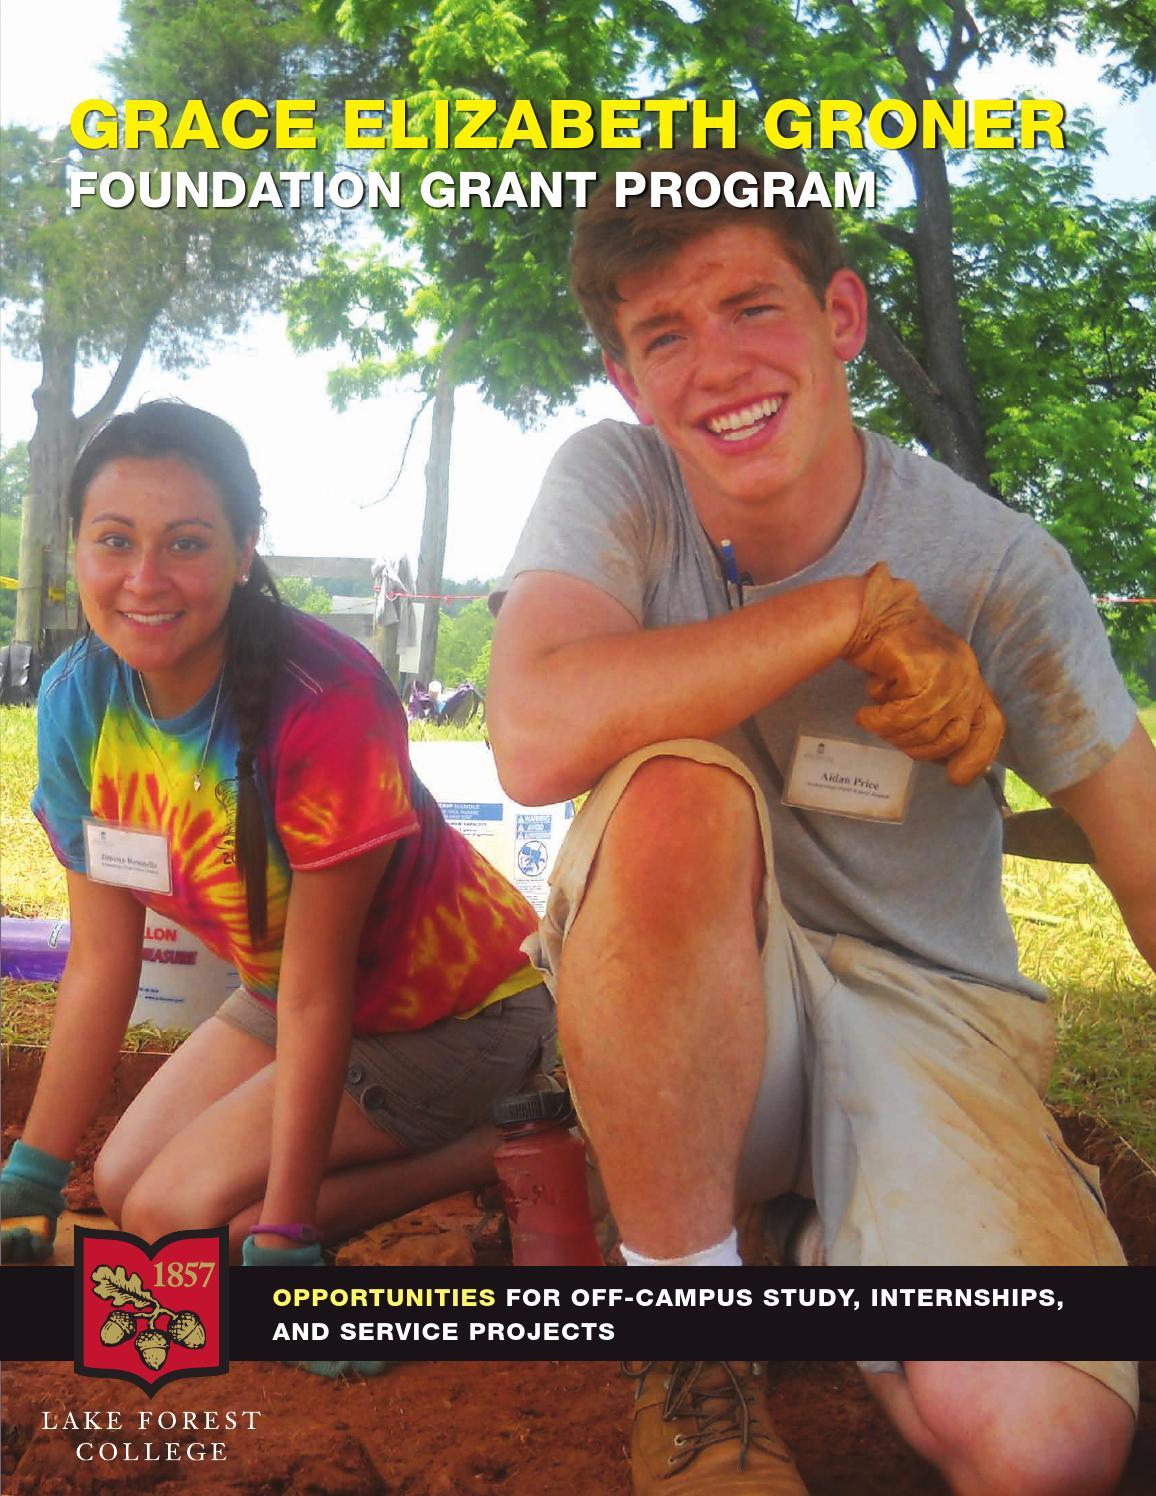 Groner Foundation Program 2014 By Lake Forest College border=